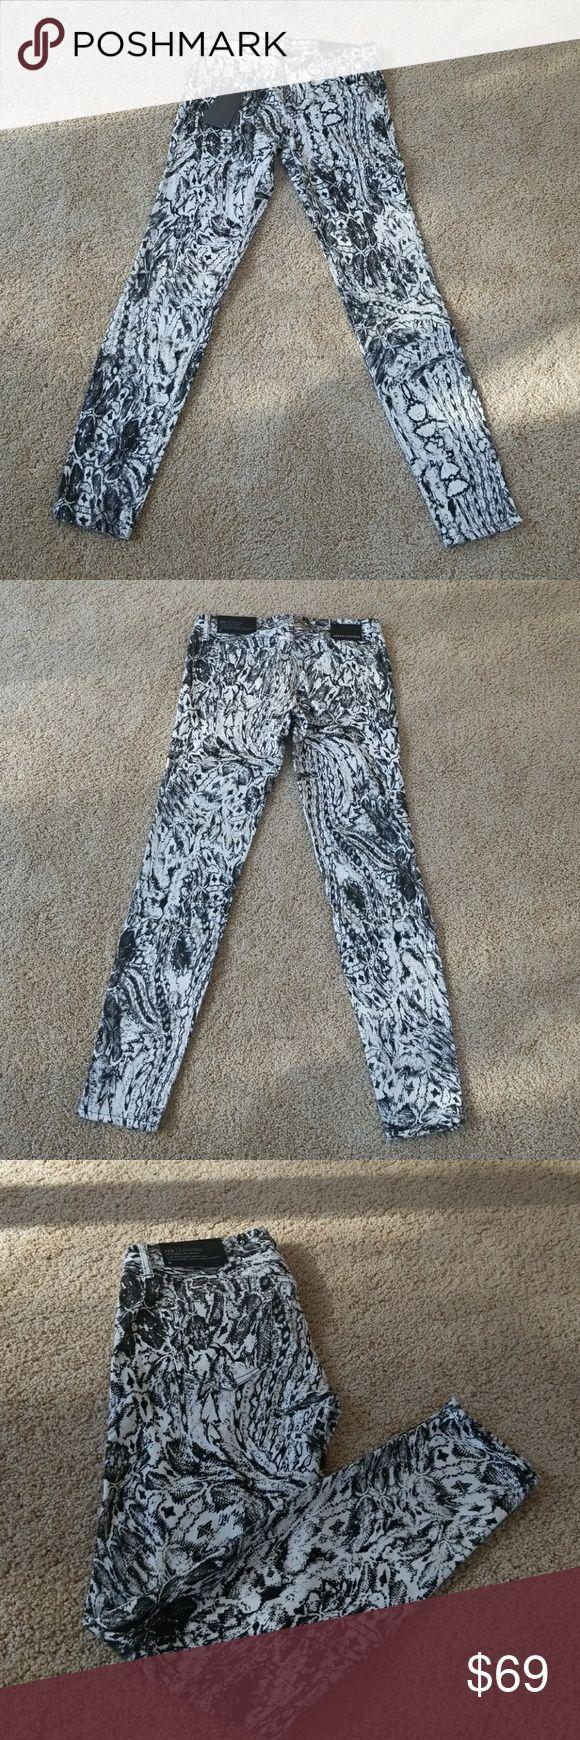 NWT! Armani Exchange Digital Print Skinny Jeans Brand NWT! Armani Exchange Digital Print Skinny Jeans. So cool! Armani Exchange Jeans Skinny